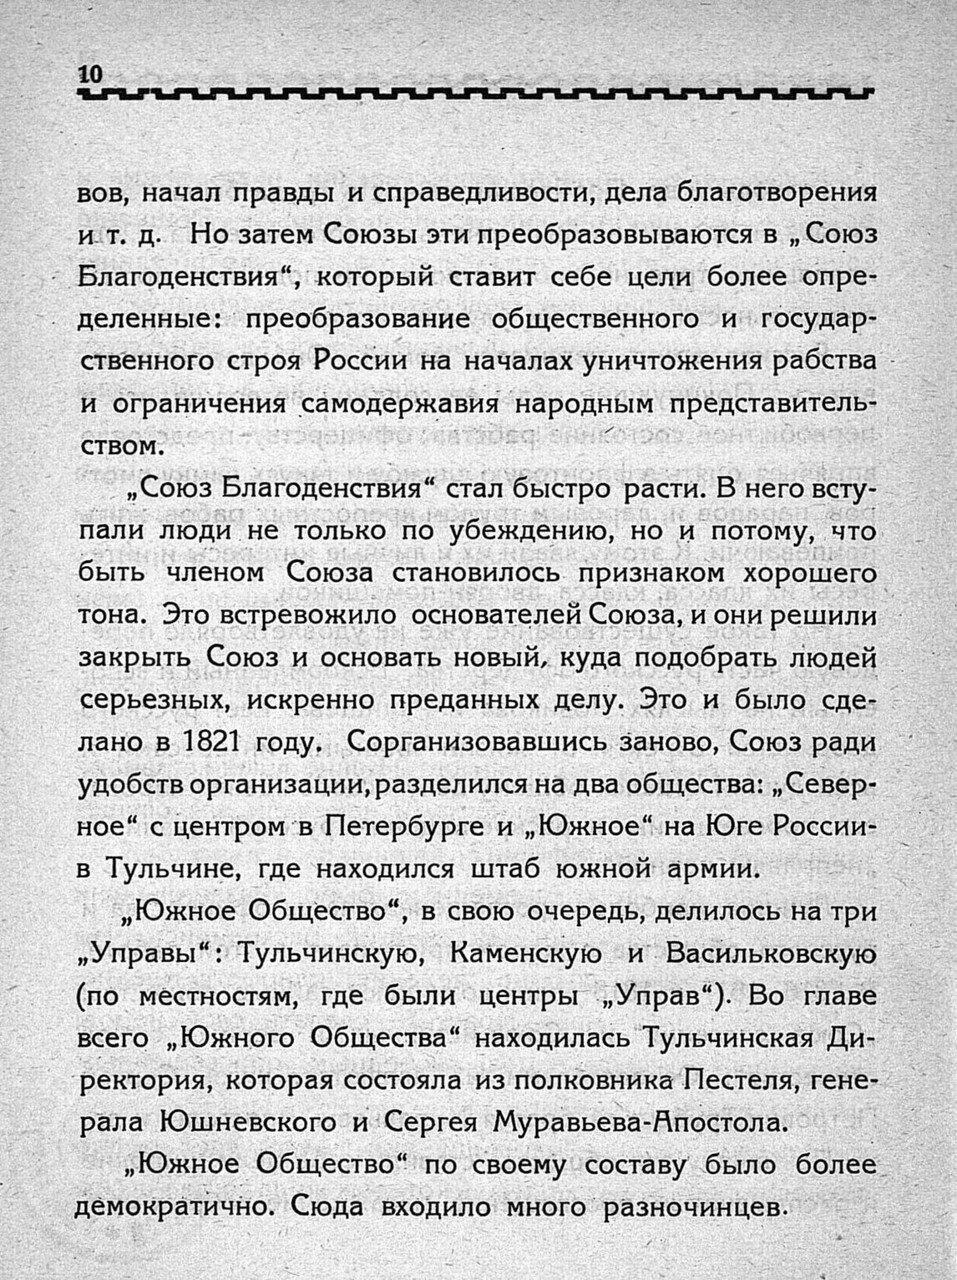 https://img-fotki.yandex.ru/get/128446/199368979.23/0_1bface_d8a1d070_XXXL.jpg